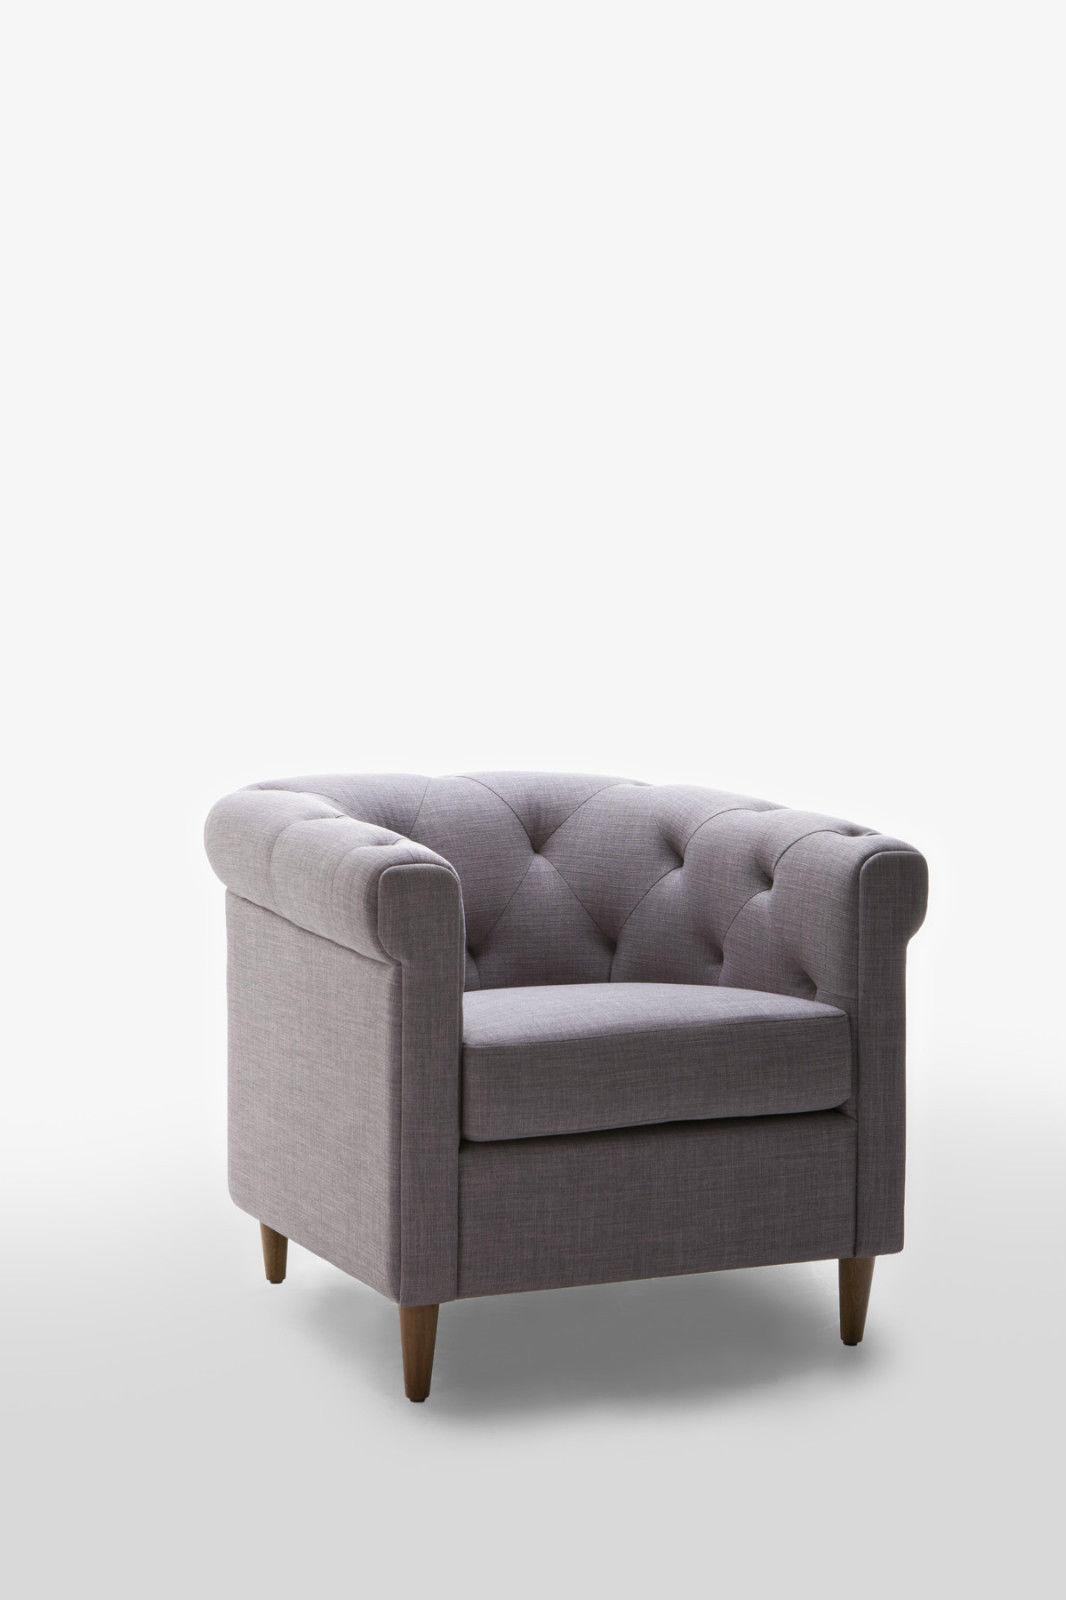 Cube Brand New Modern Designer Replica Fabric Armchair